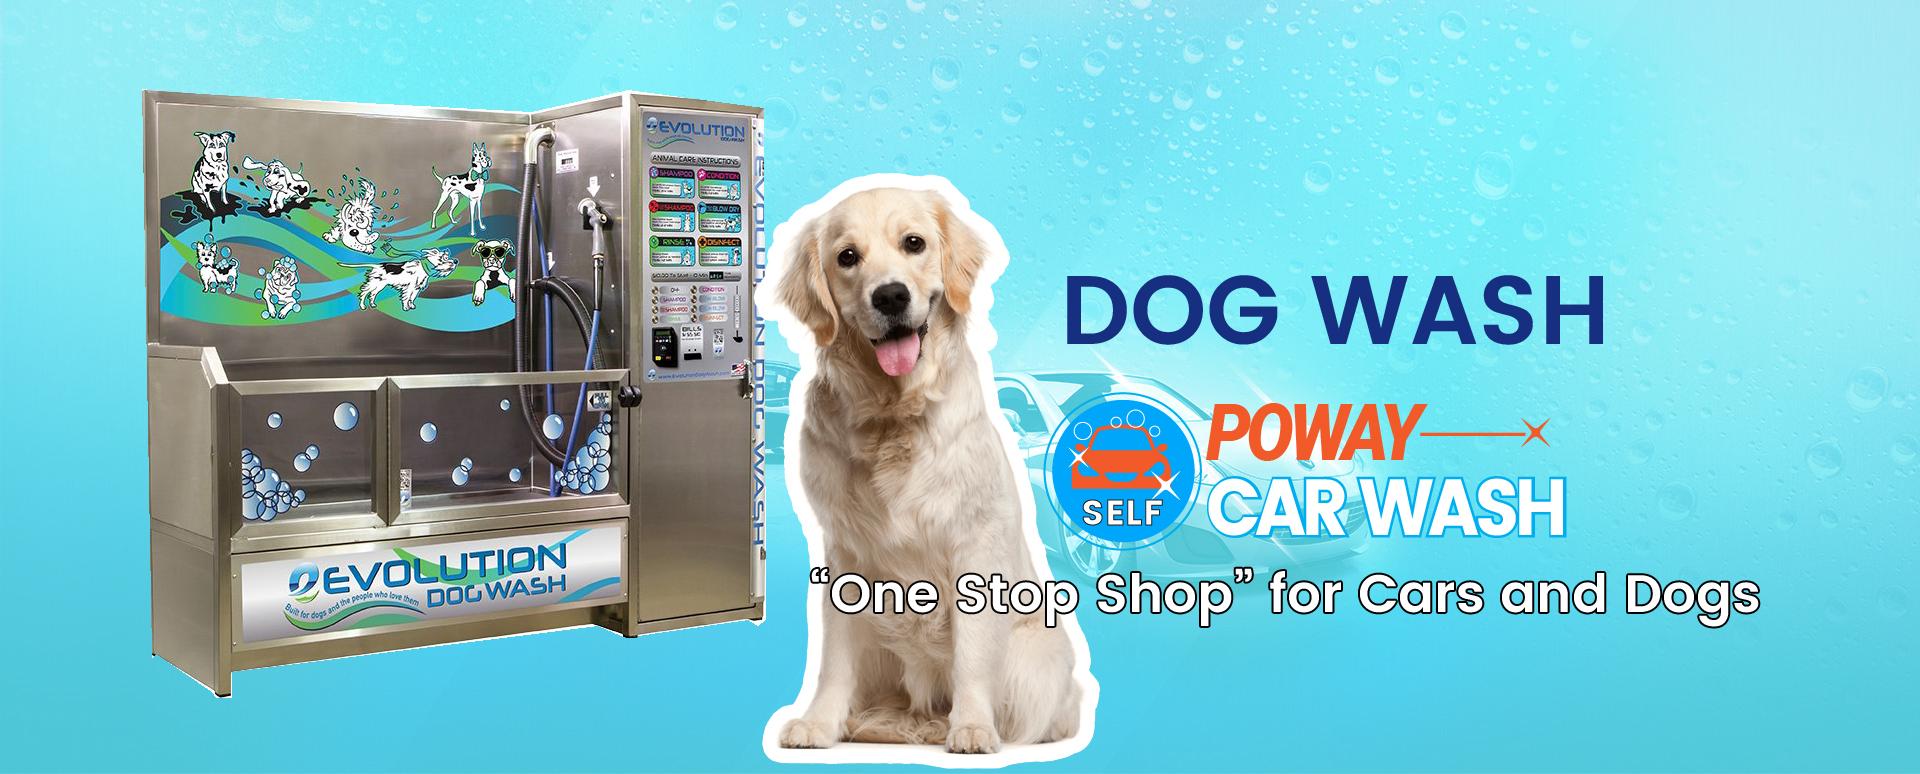 dog wash service San Diego